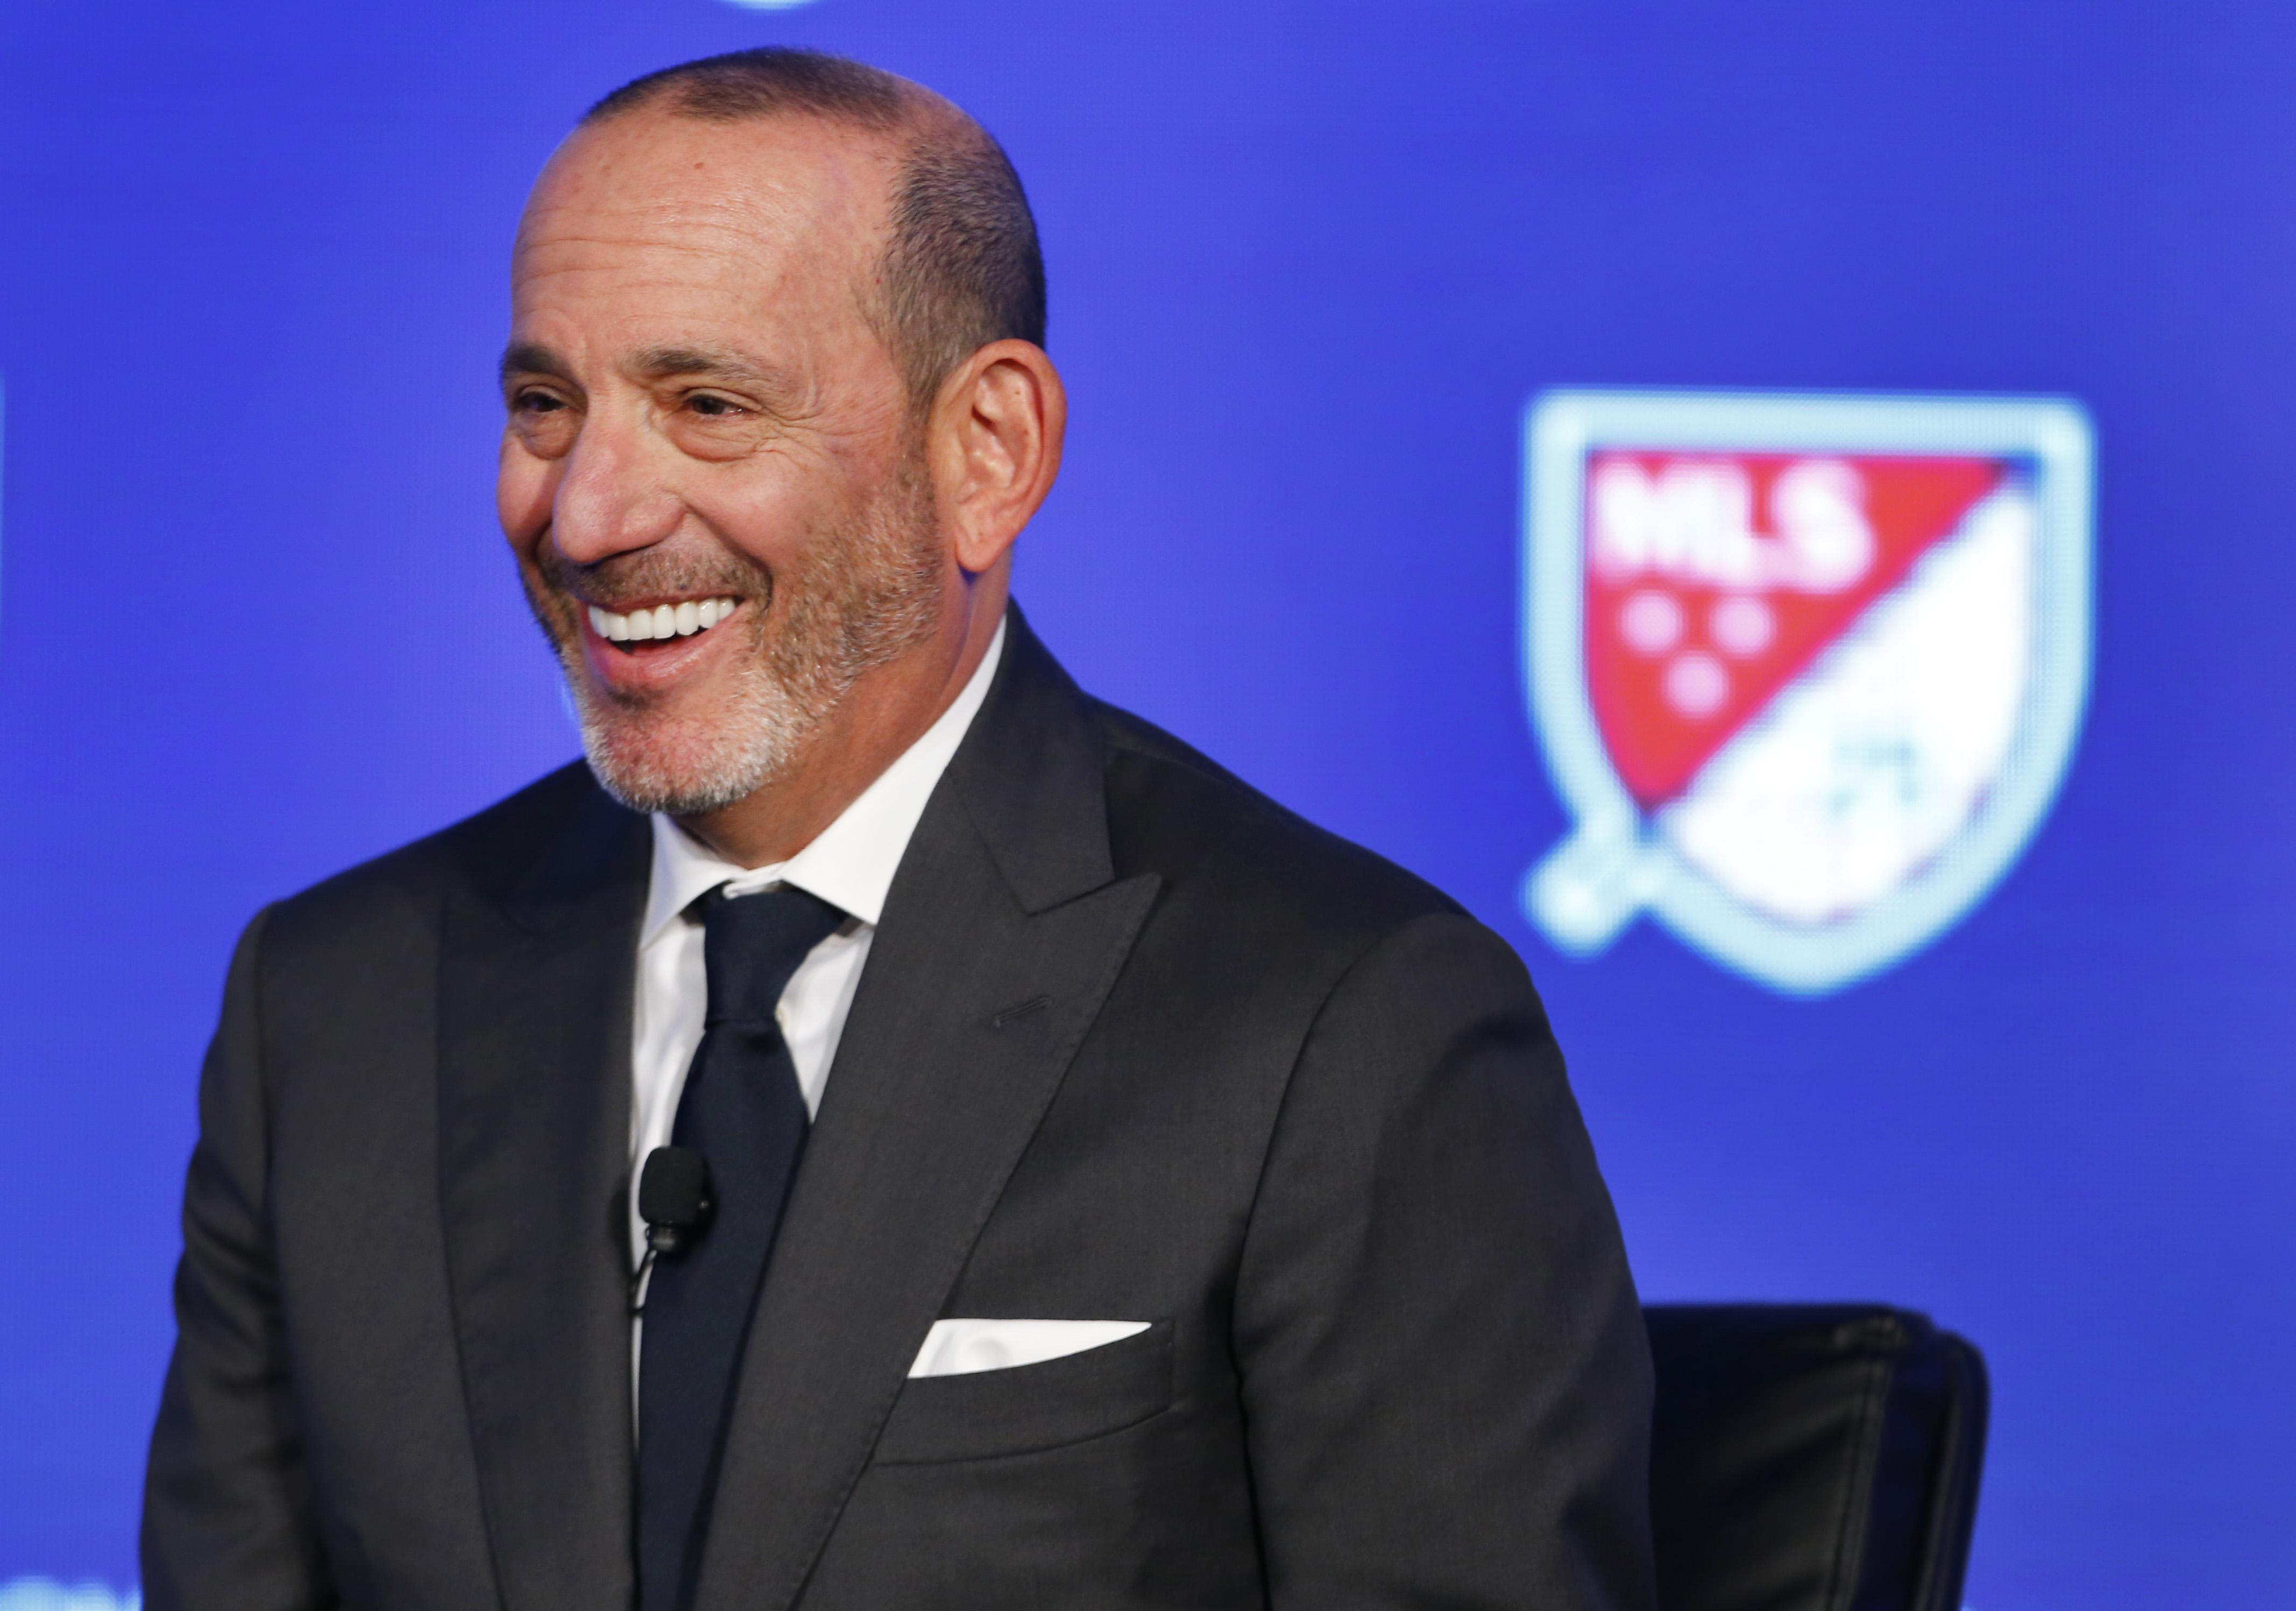 MLS: MLS Media Day